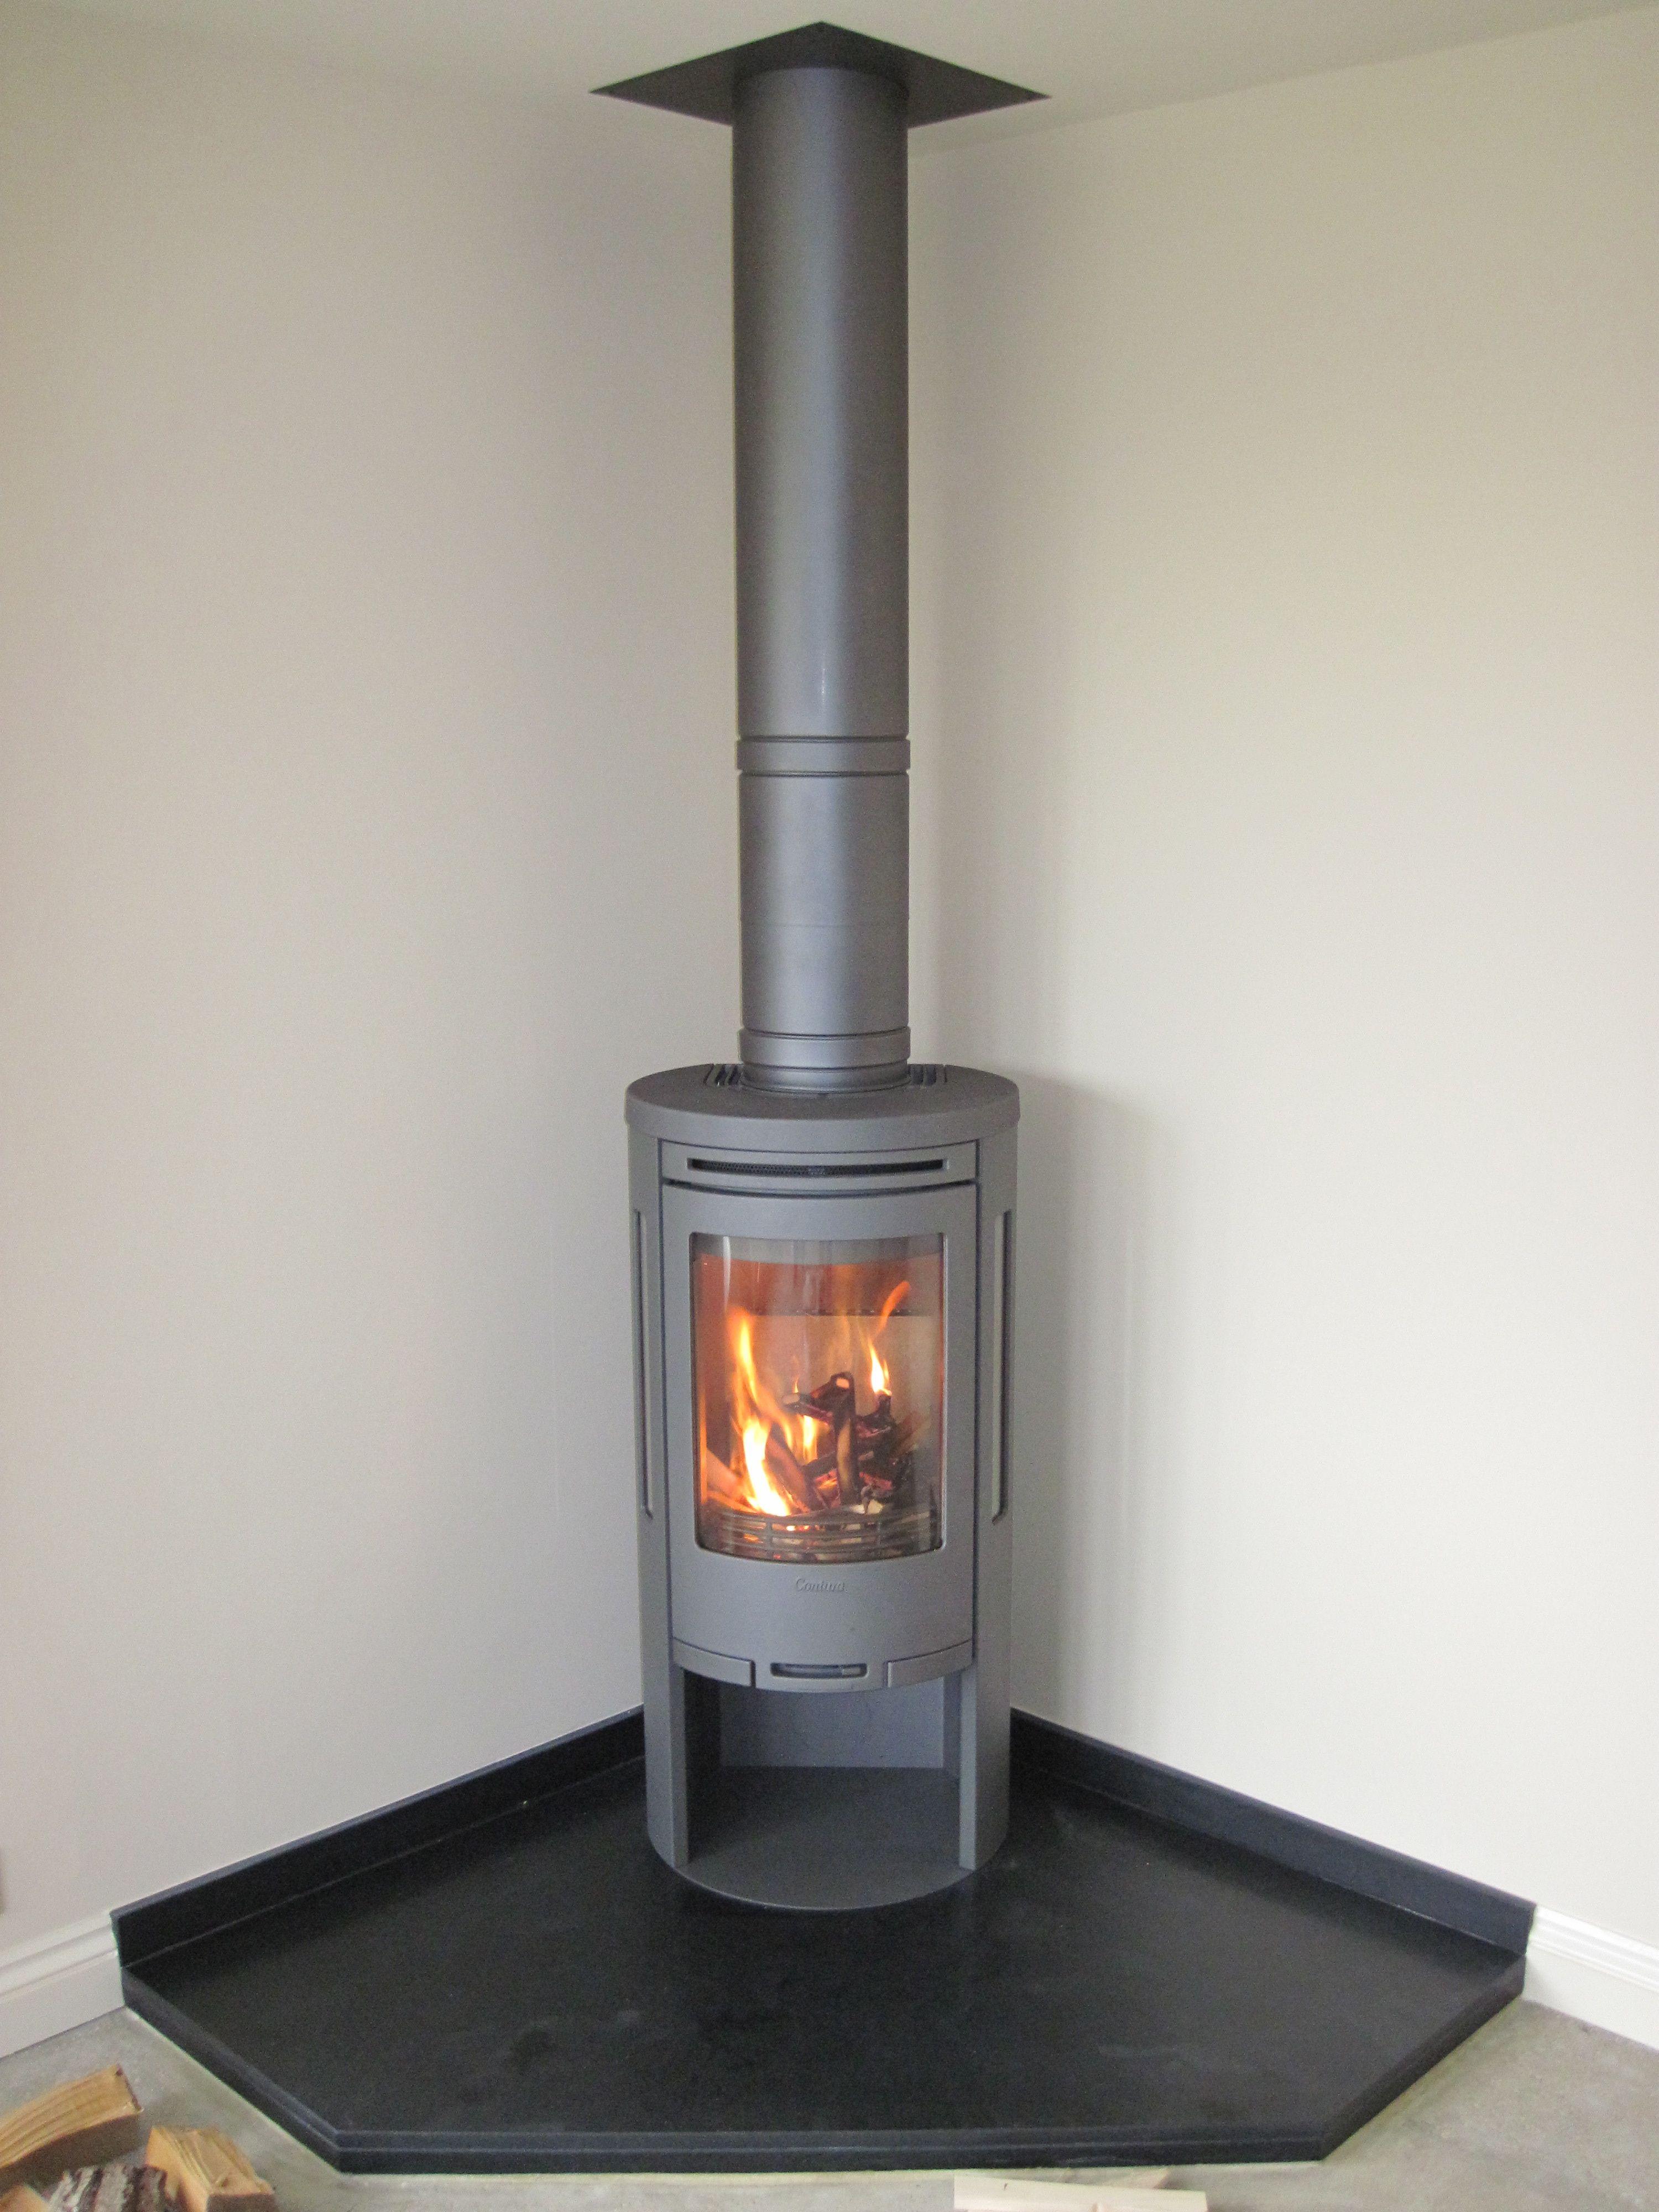 Contura 585 Wood Burner Poujoulat Flue Sprayed The Same Colour Black Granite Corner Hearth With Granite Skirti Wood Burner Tiny Wood Stove Wood Burning Stove